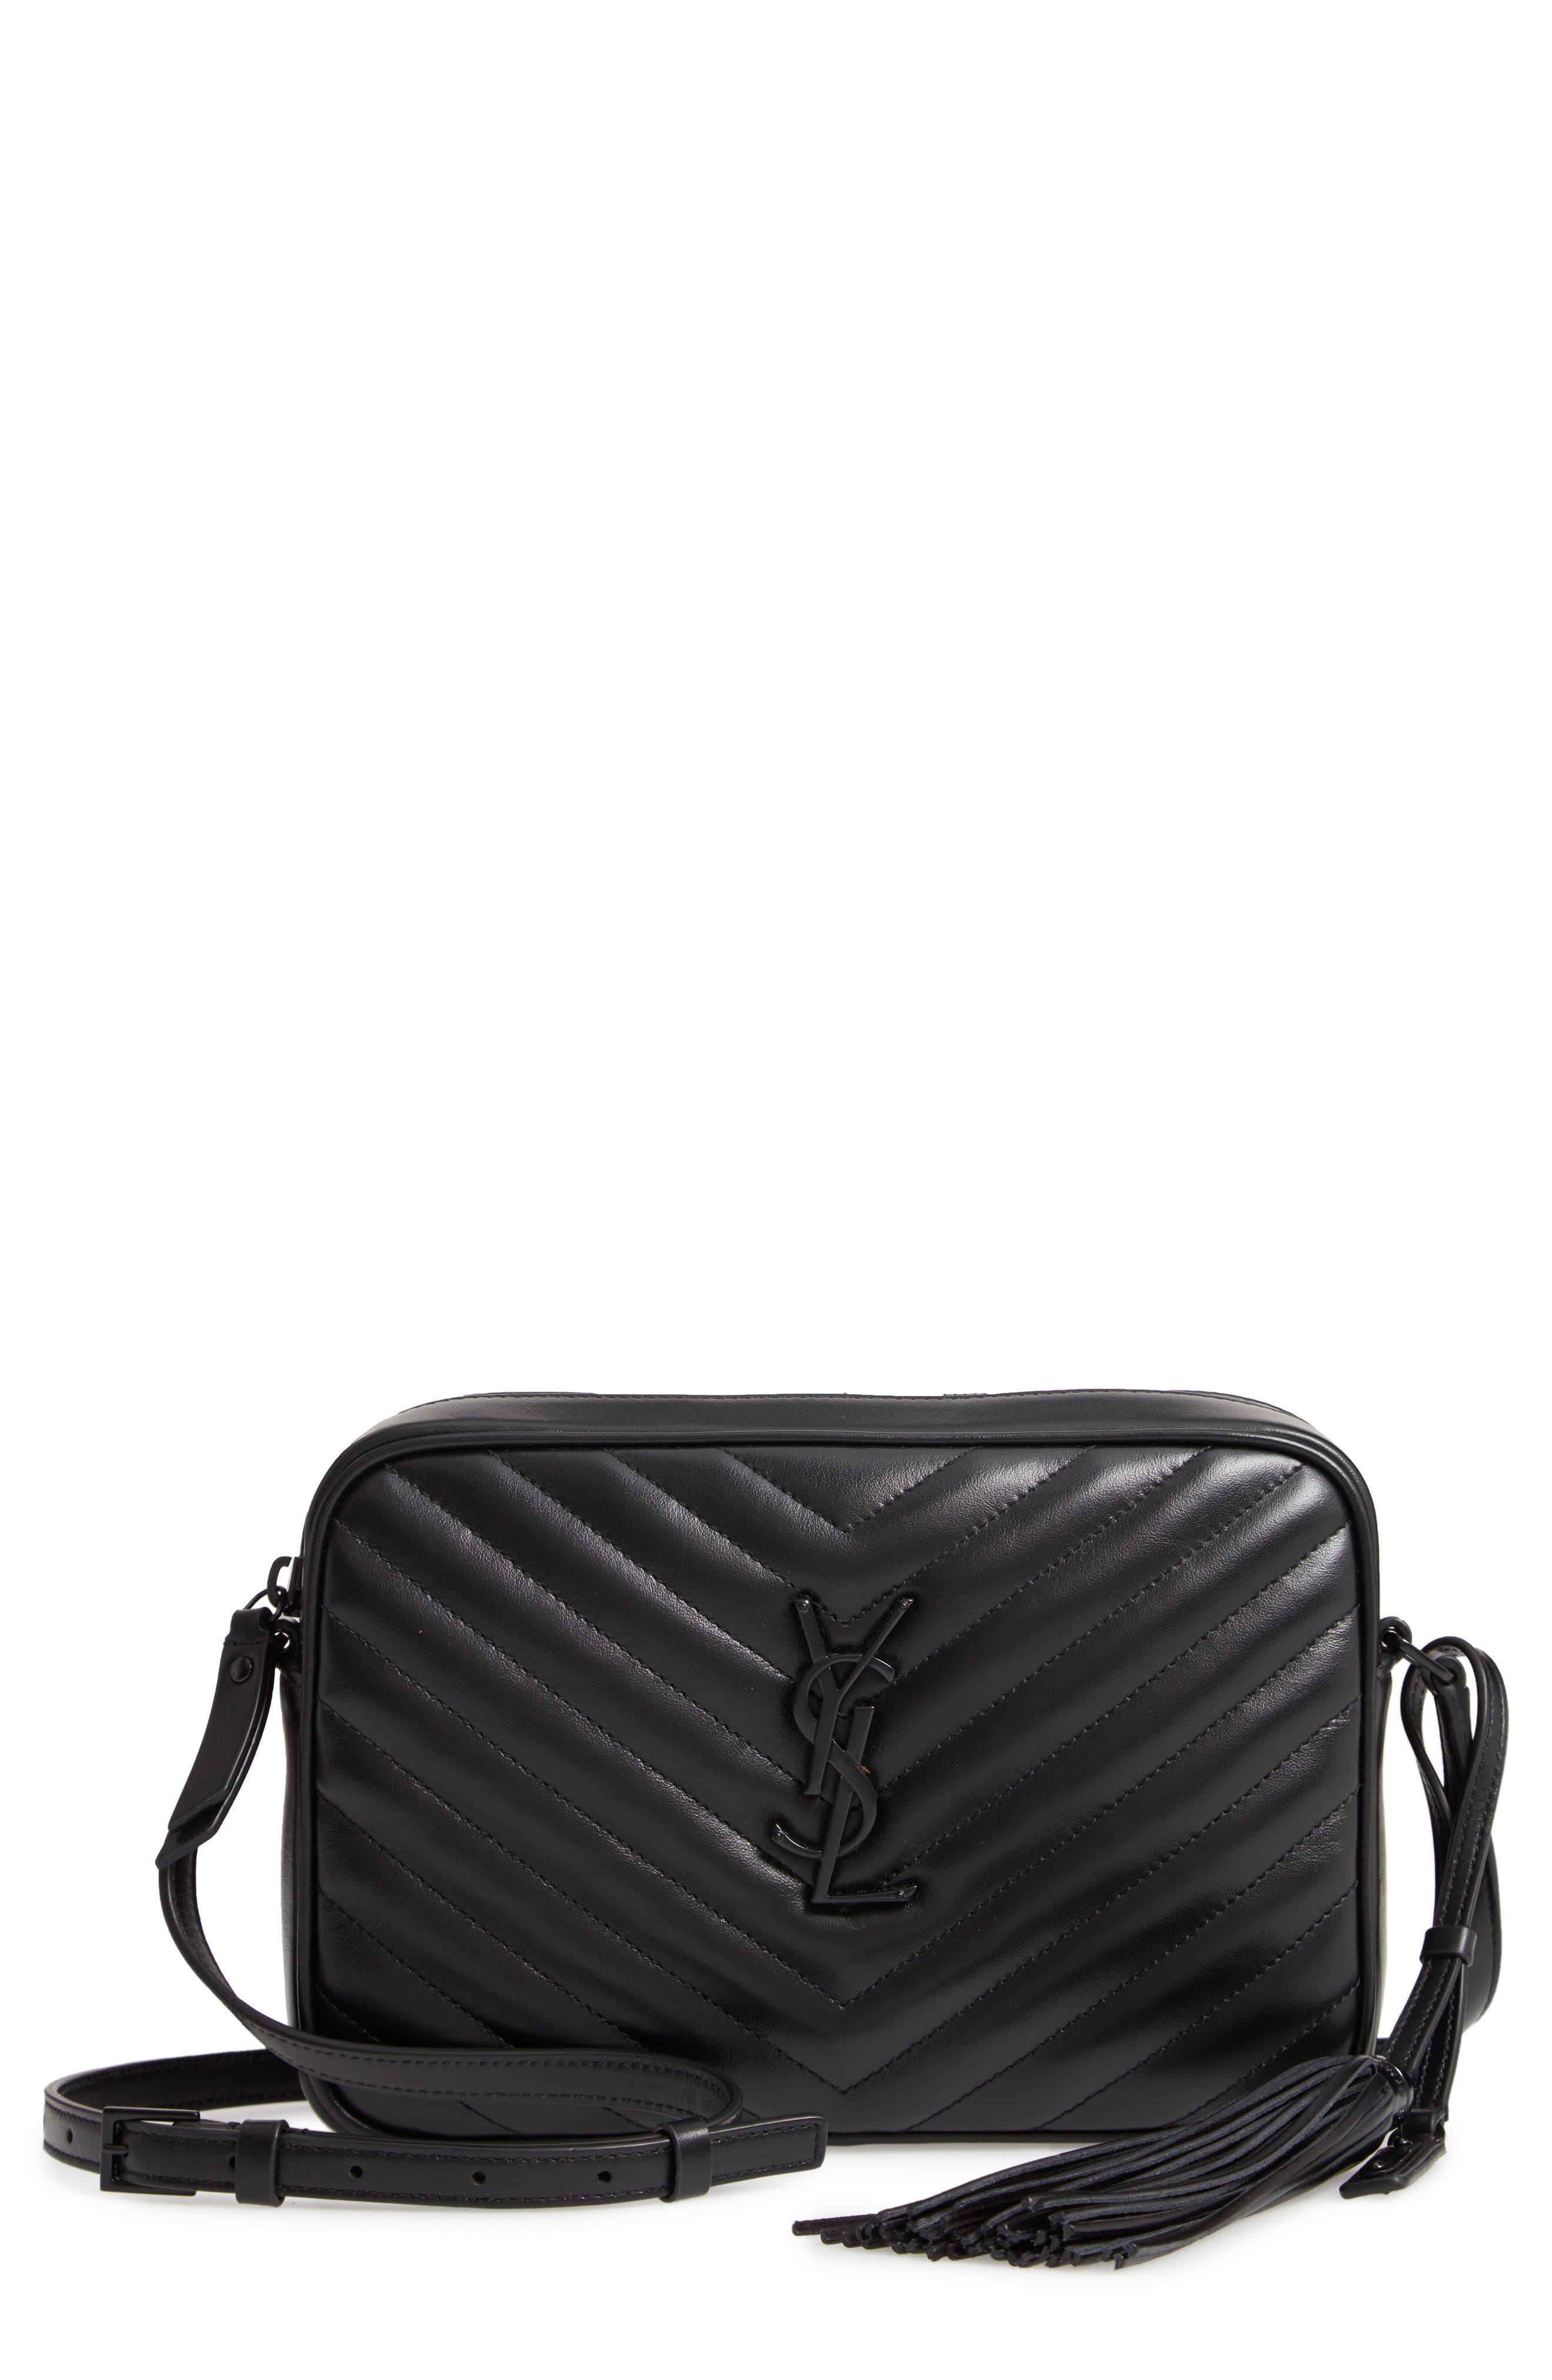 b574a703b86 Saint Laurent Loulou Monogram Ysl Medium Chevron Quilted Leather Camera  Shoulder Bag - Black Hardware In